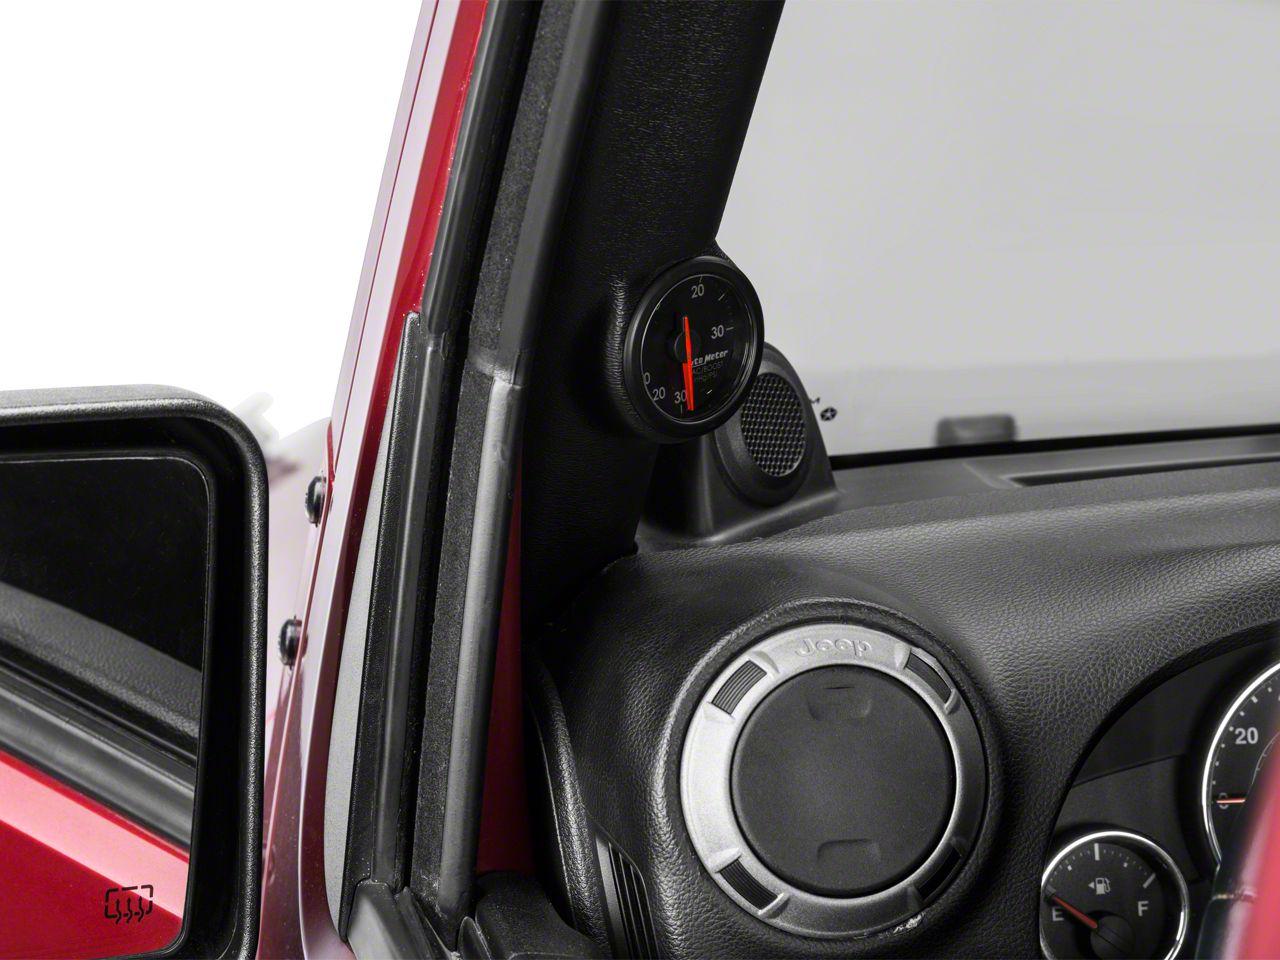 Auto Meter AirDrive Boost/Vac Gauge - Electrical (97-18 Jeep Wrangler TJ, JK & JL)